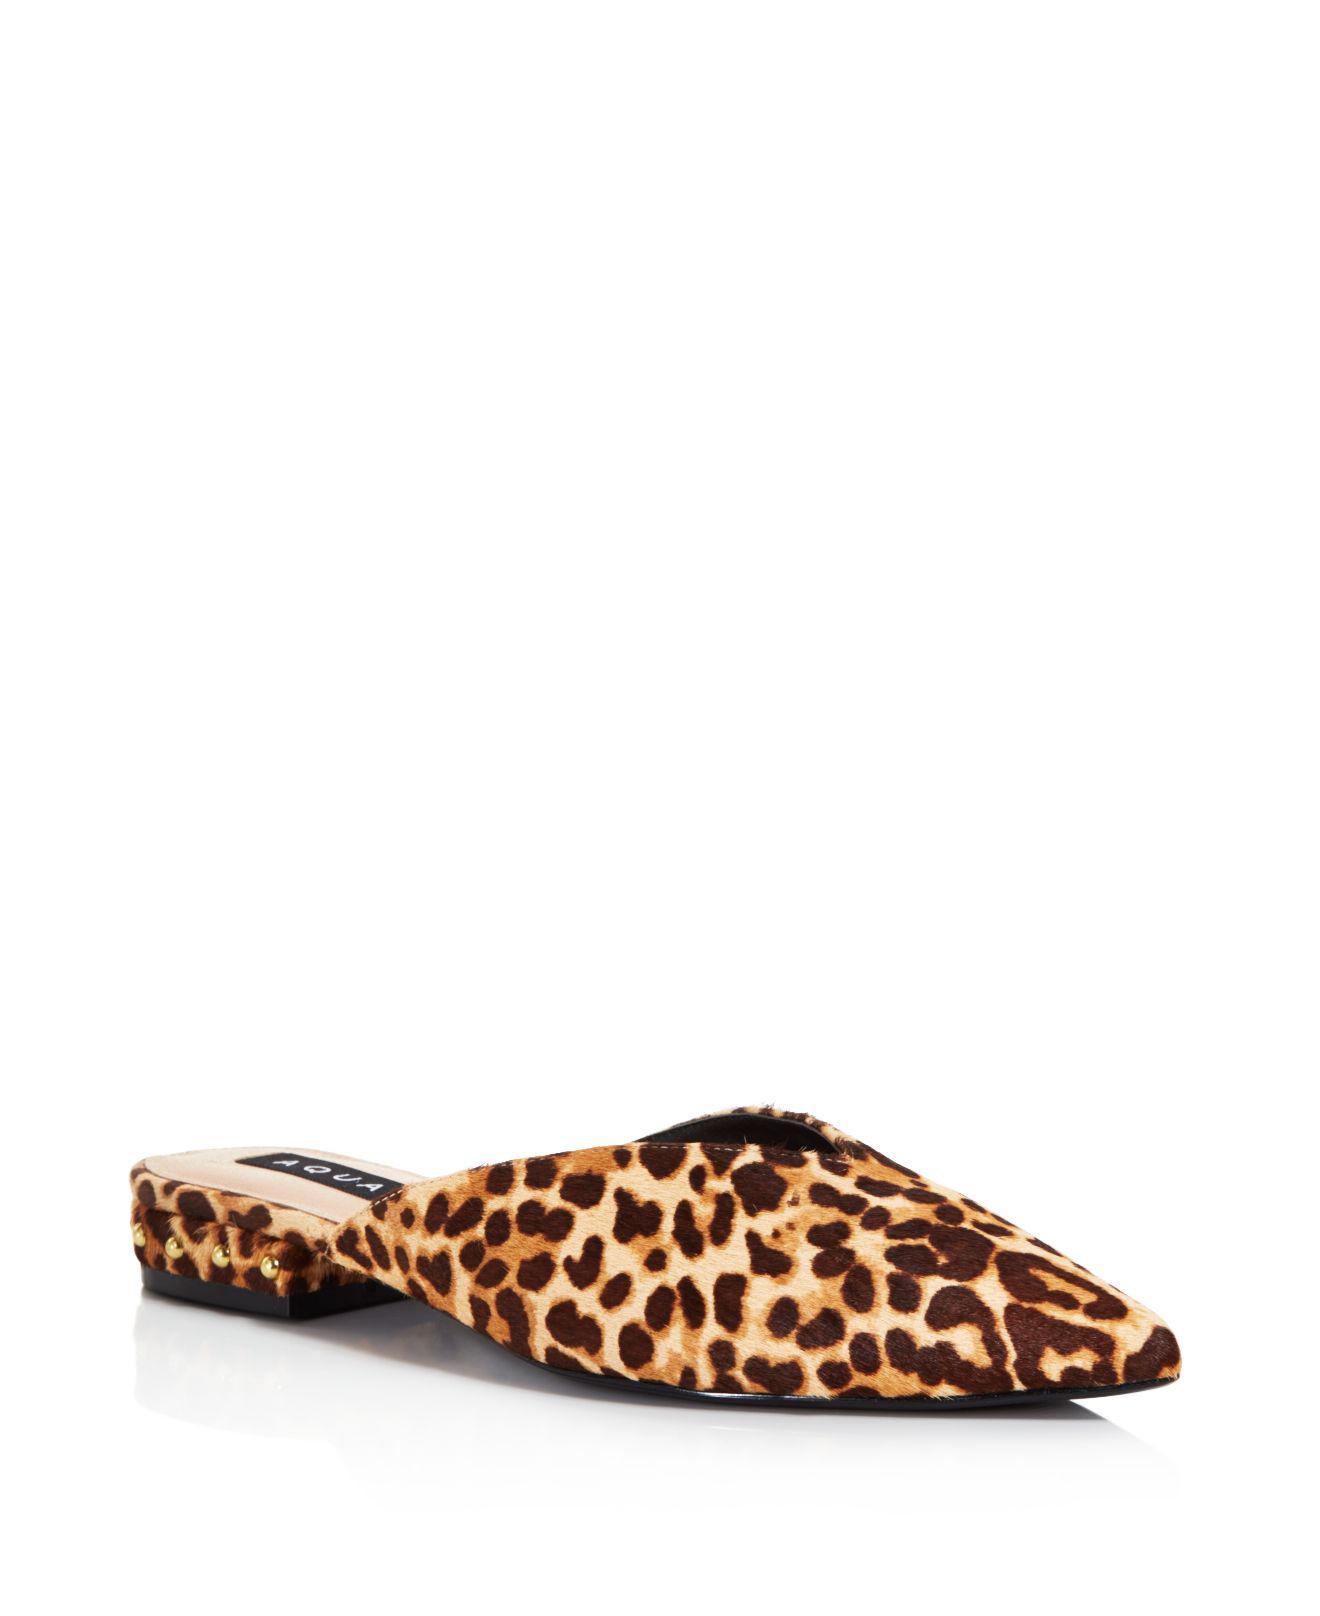 Aqua Women's Leopard Print Calf Hair Mules - 100% Exclusive OMOcHsLoVa